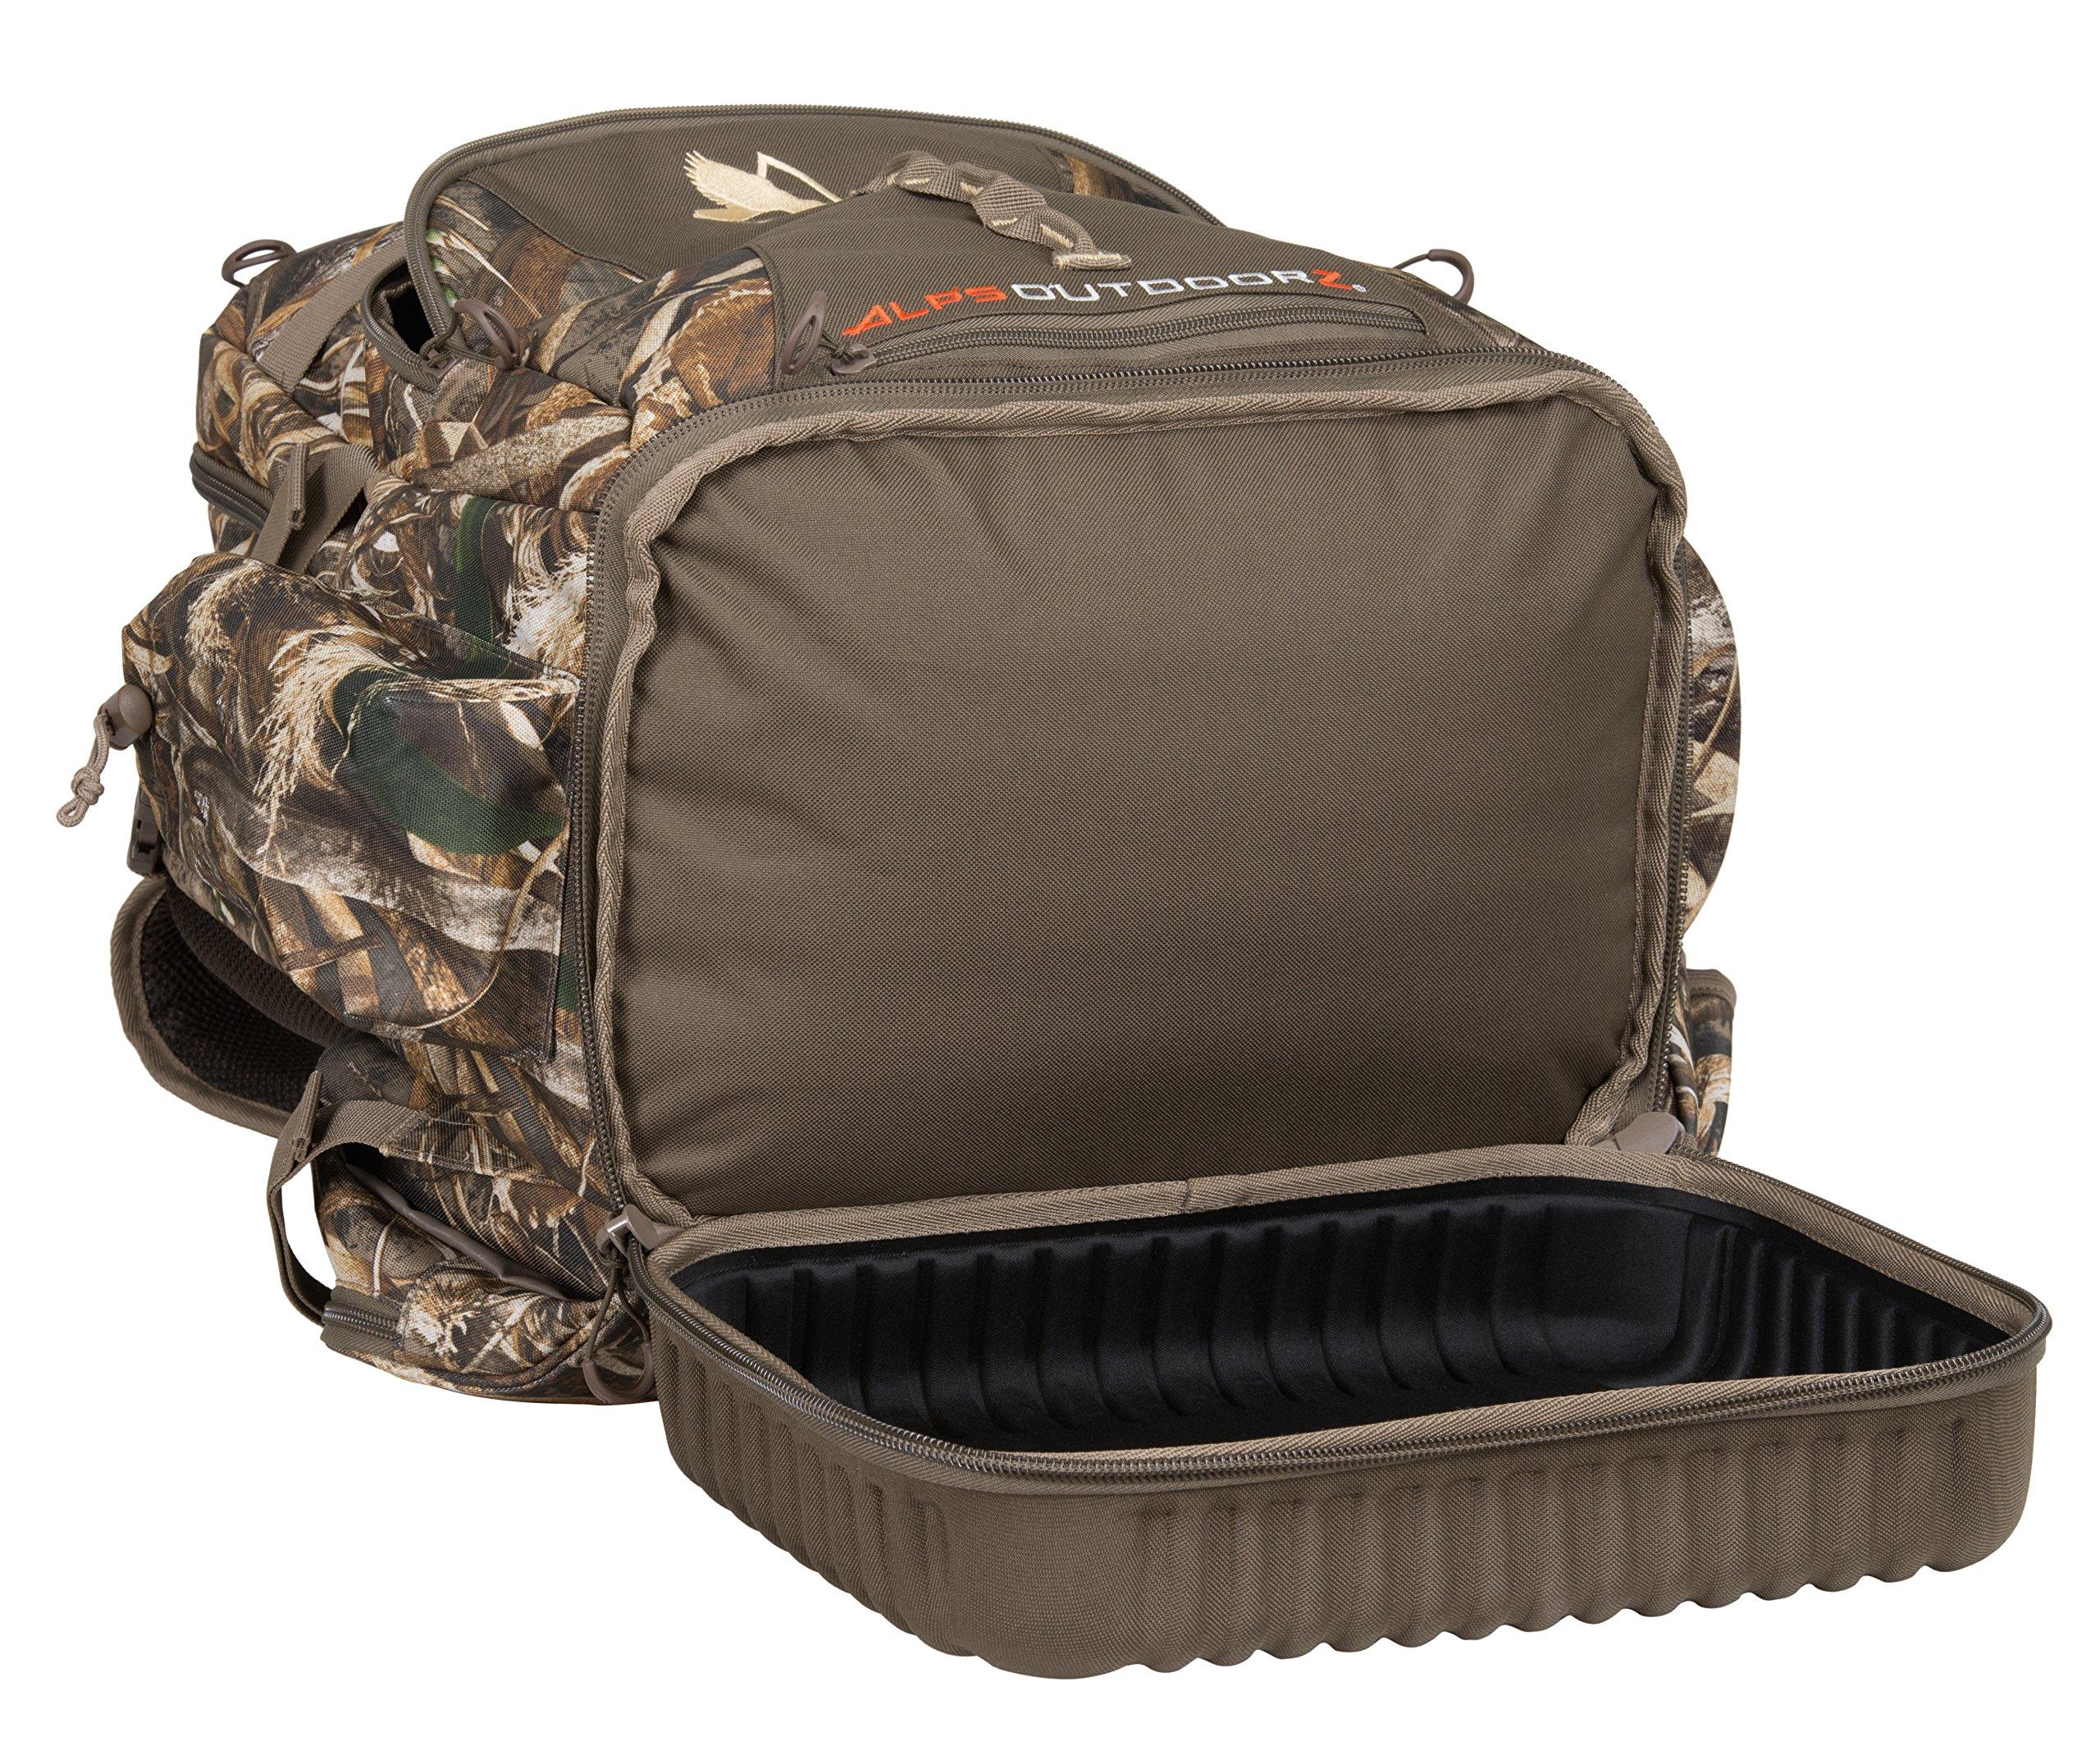 Whg Alps Outdoorz Delta Waterfowl Backpack Blind Bag